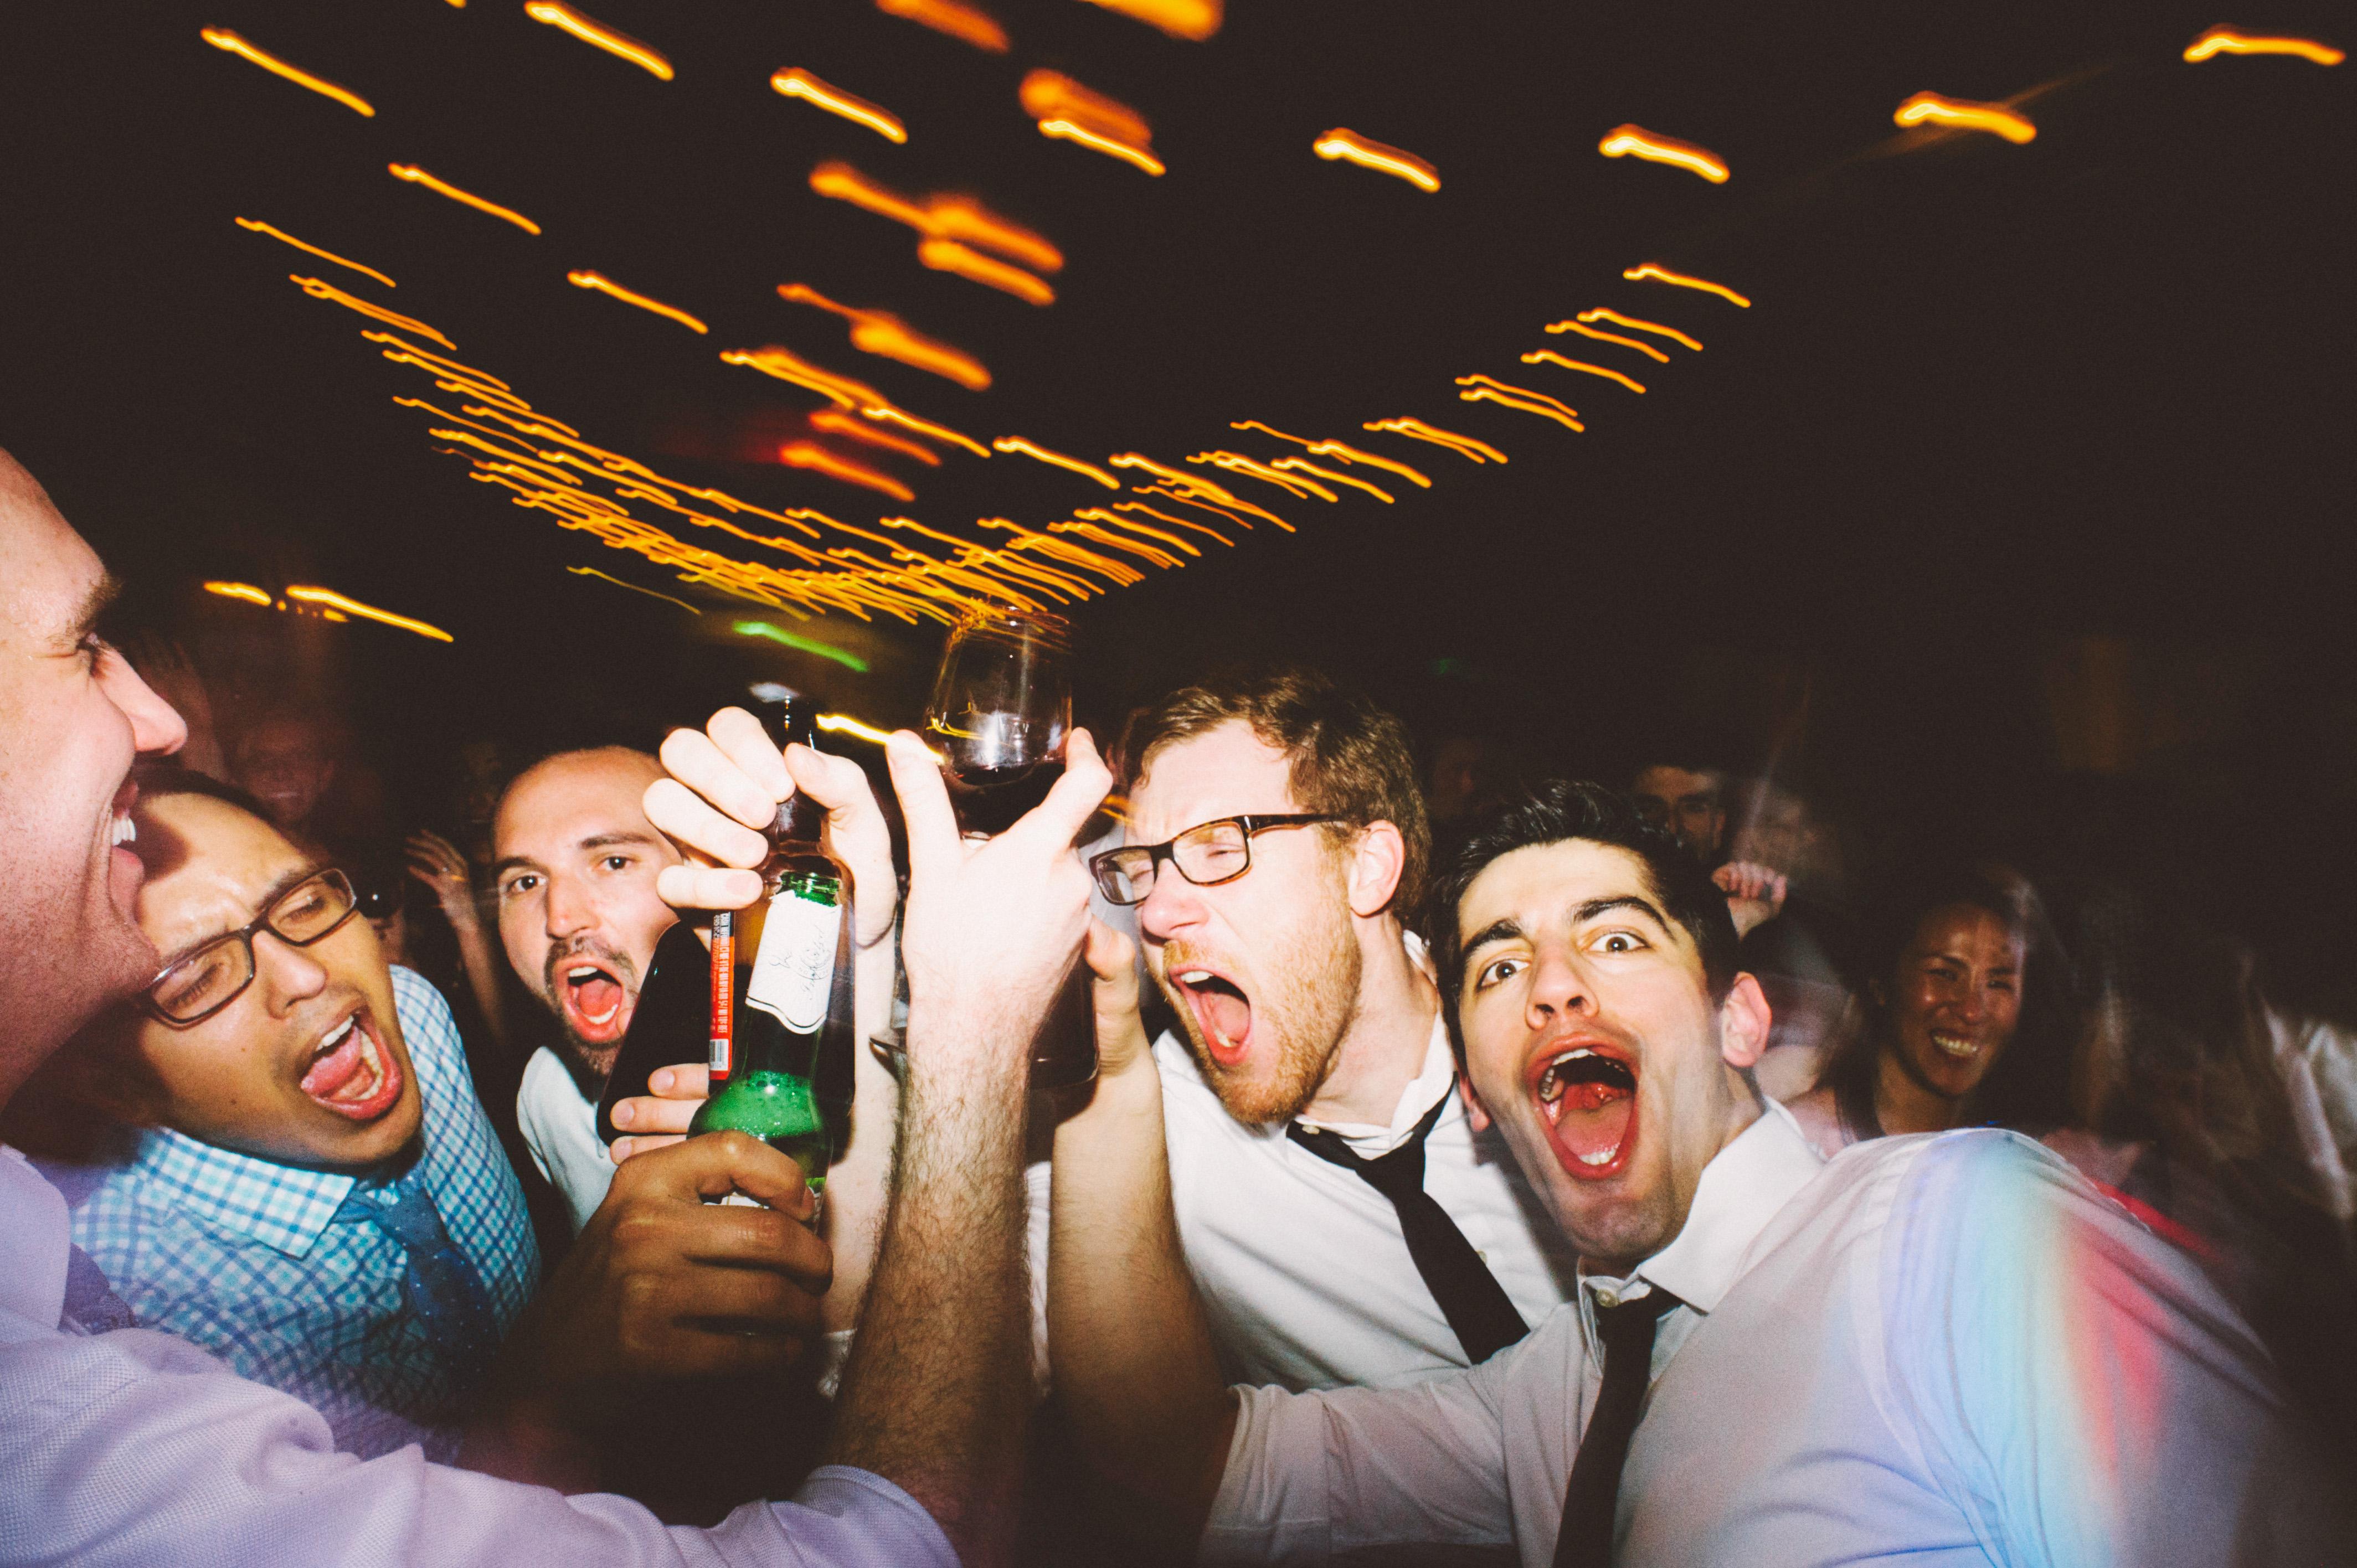 Dance floor action shots at the wedding reception - Sodo Park Wedding Photographer